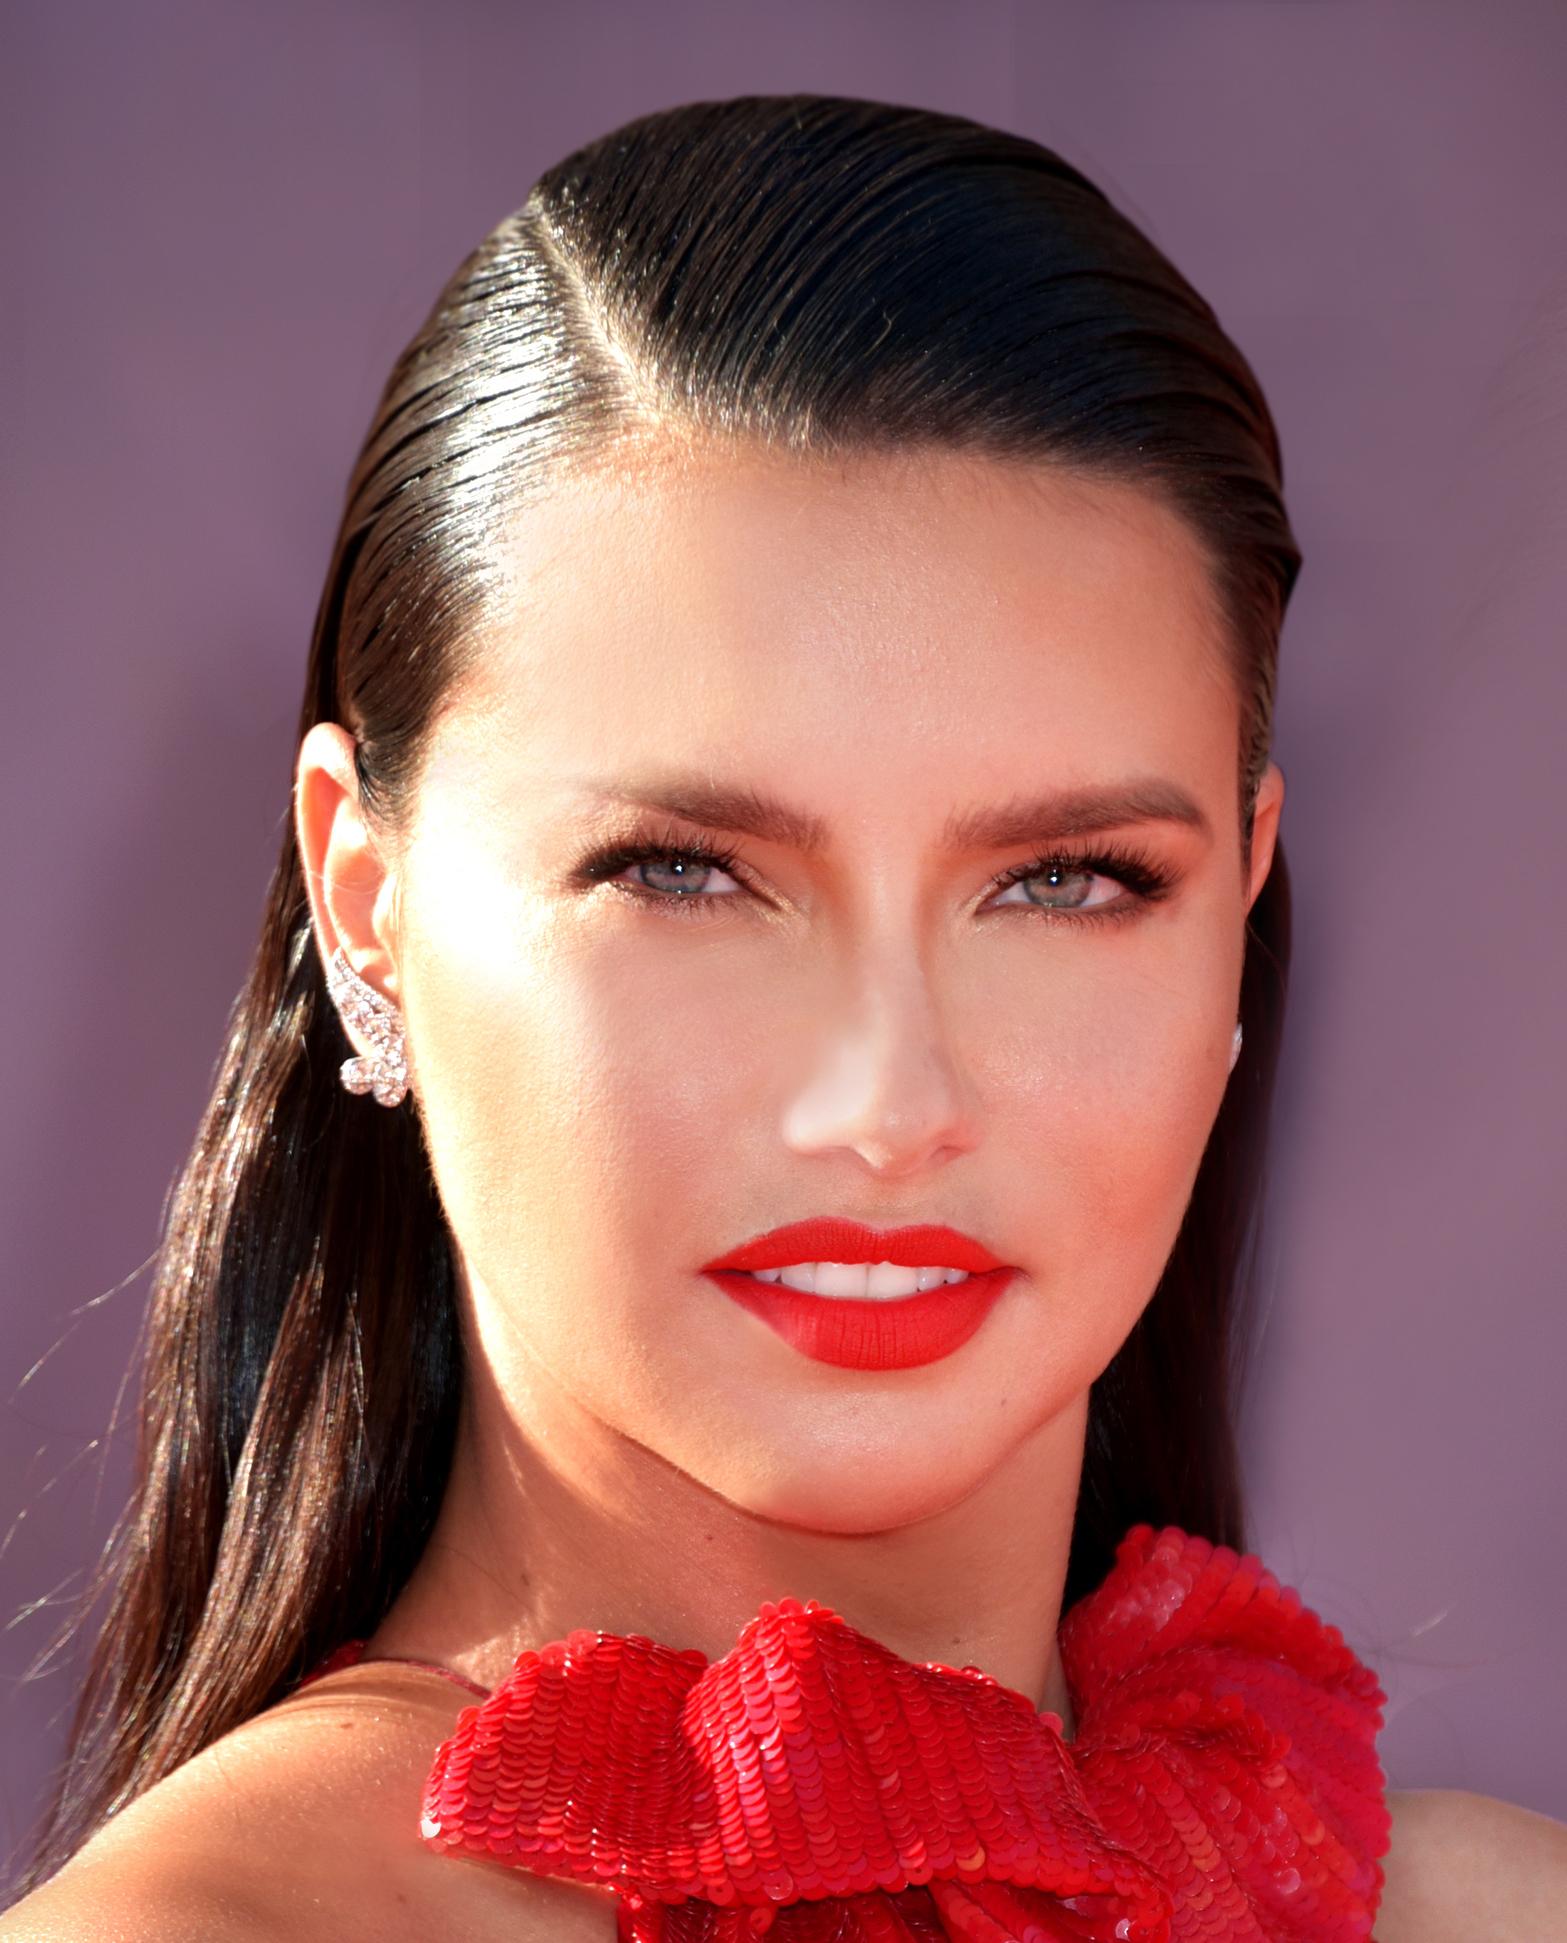 Adriana Lima - Top 10 Supermodels